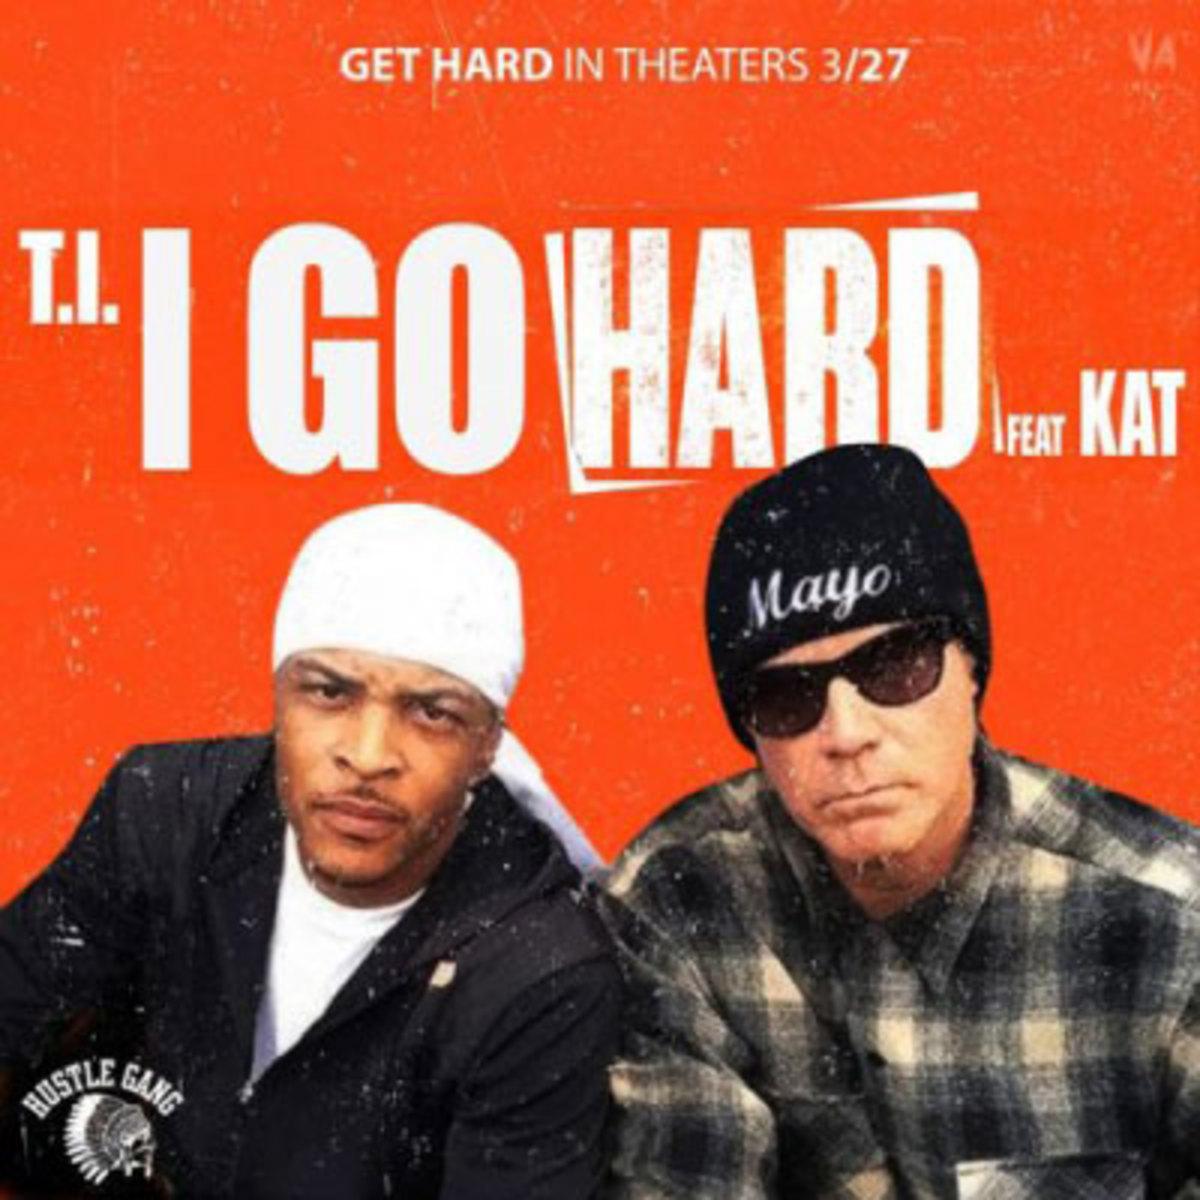 ti-i-go-hard.jpg